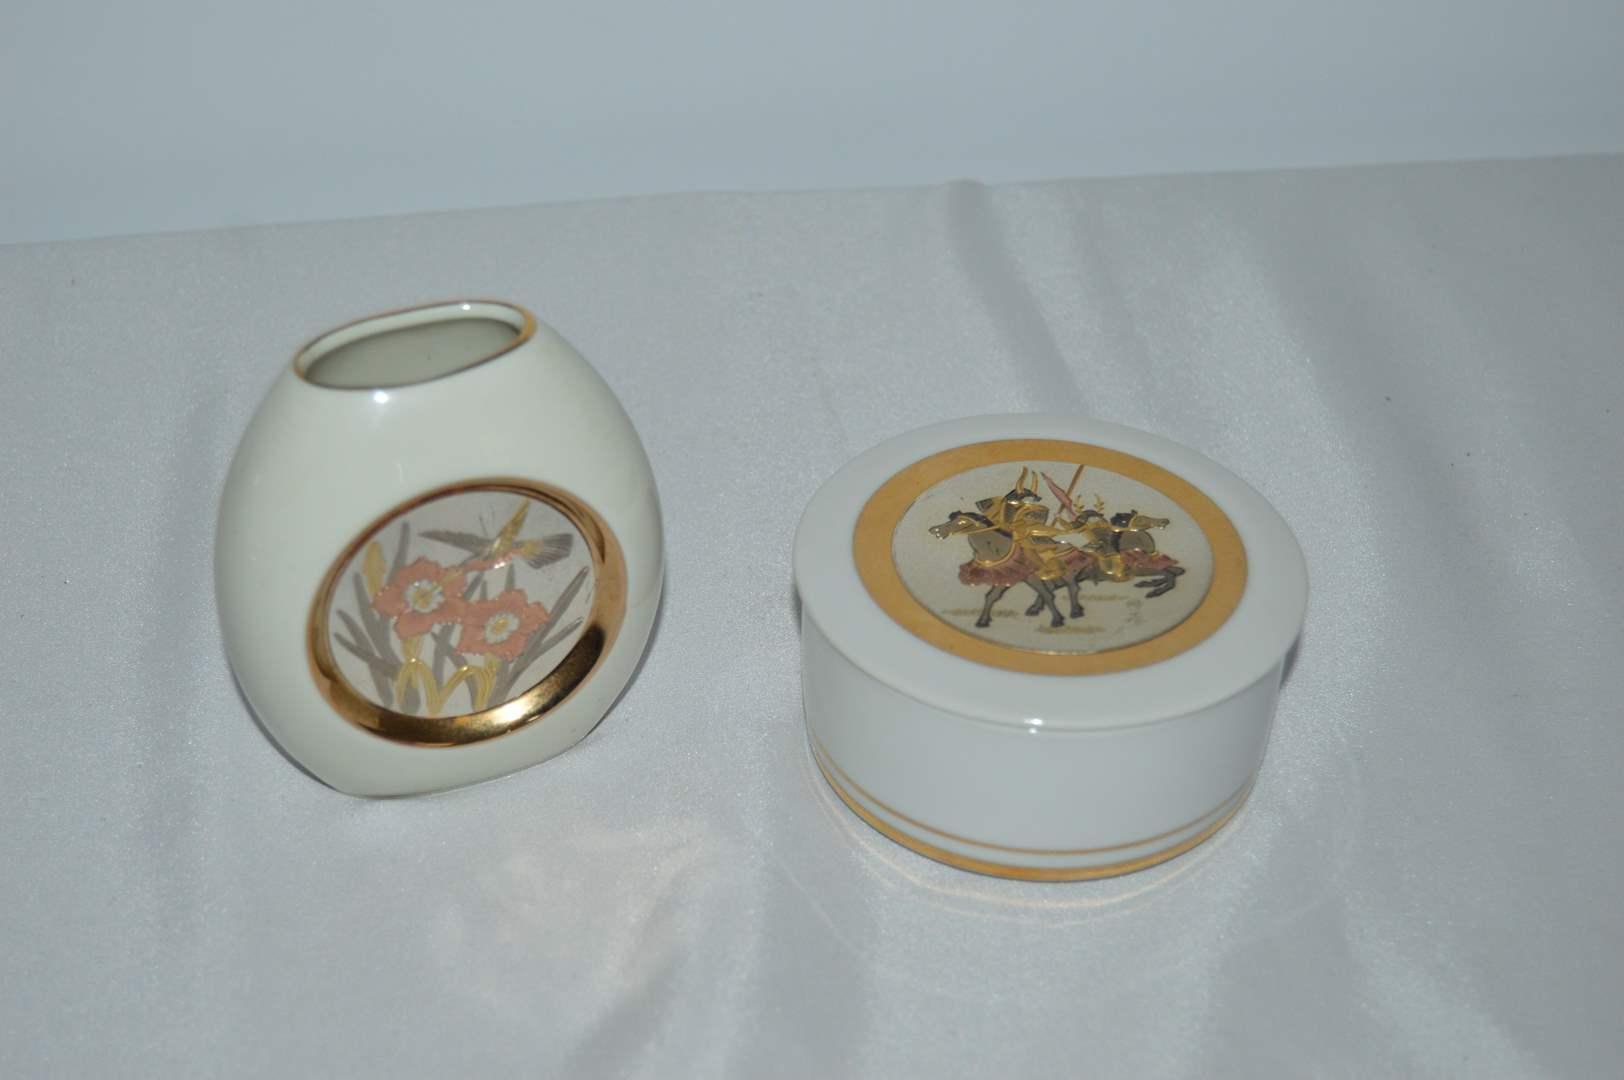 Lot # 122 Cholin vase and trinket box - Both 24k gold edged (main image)